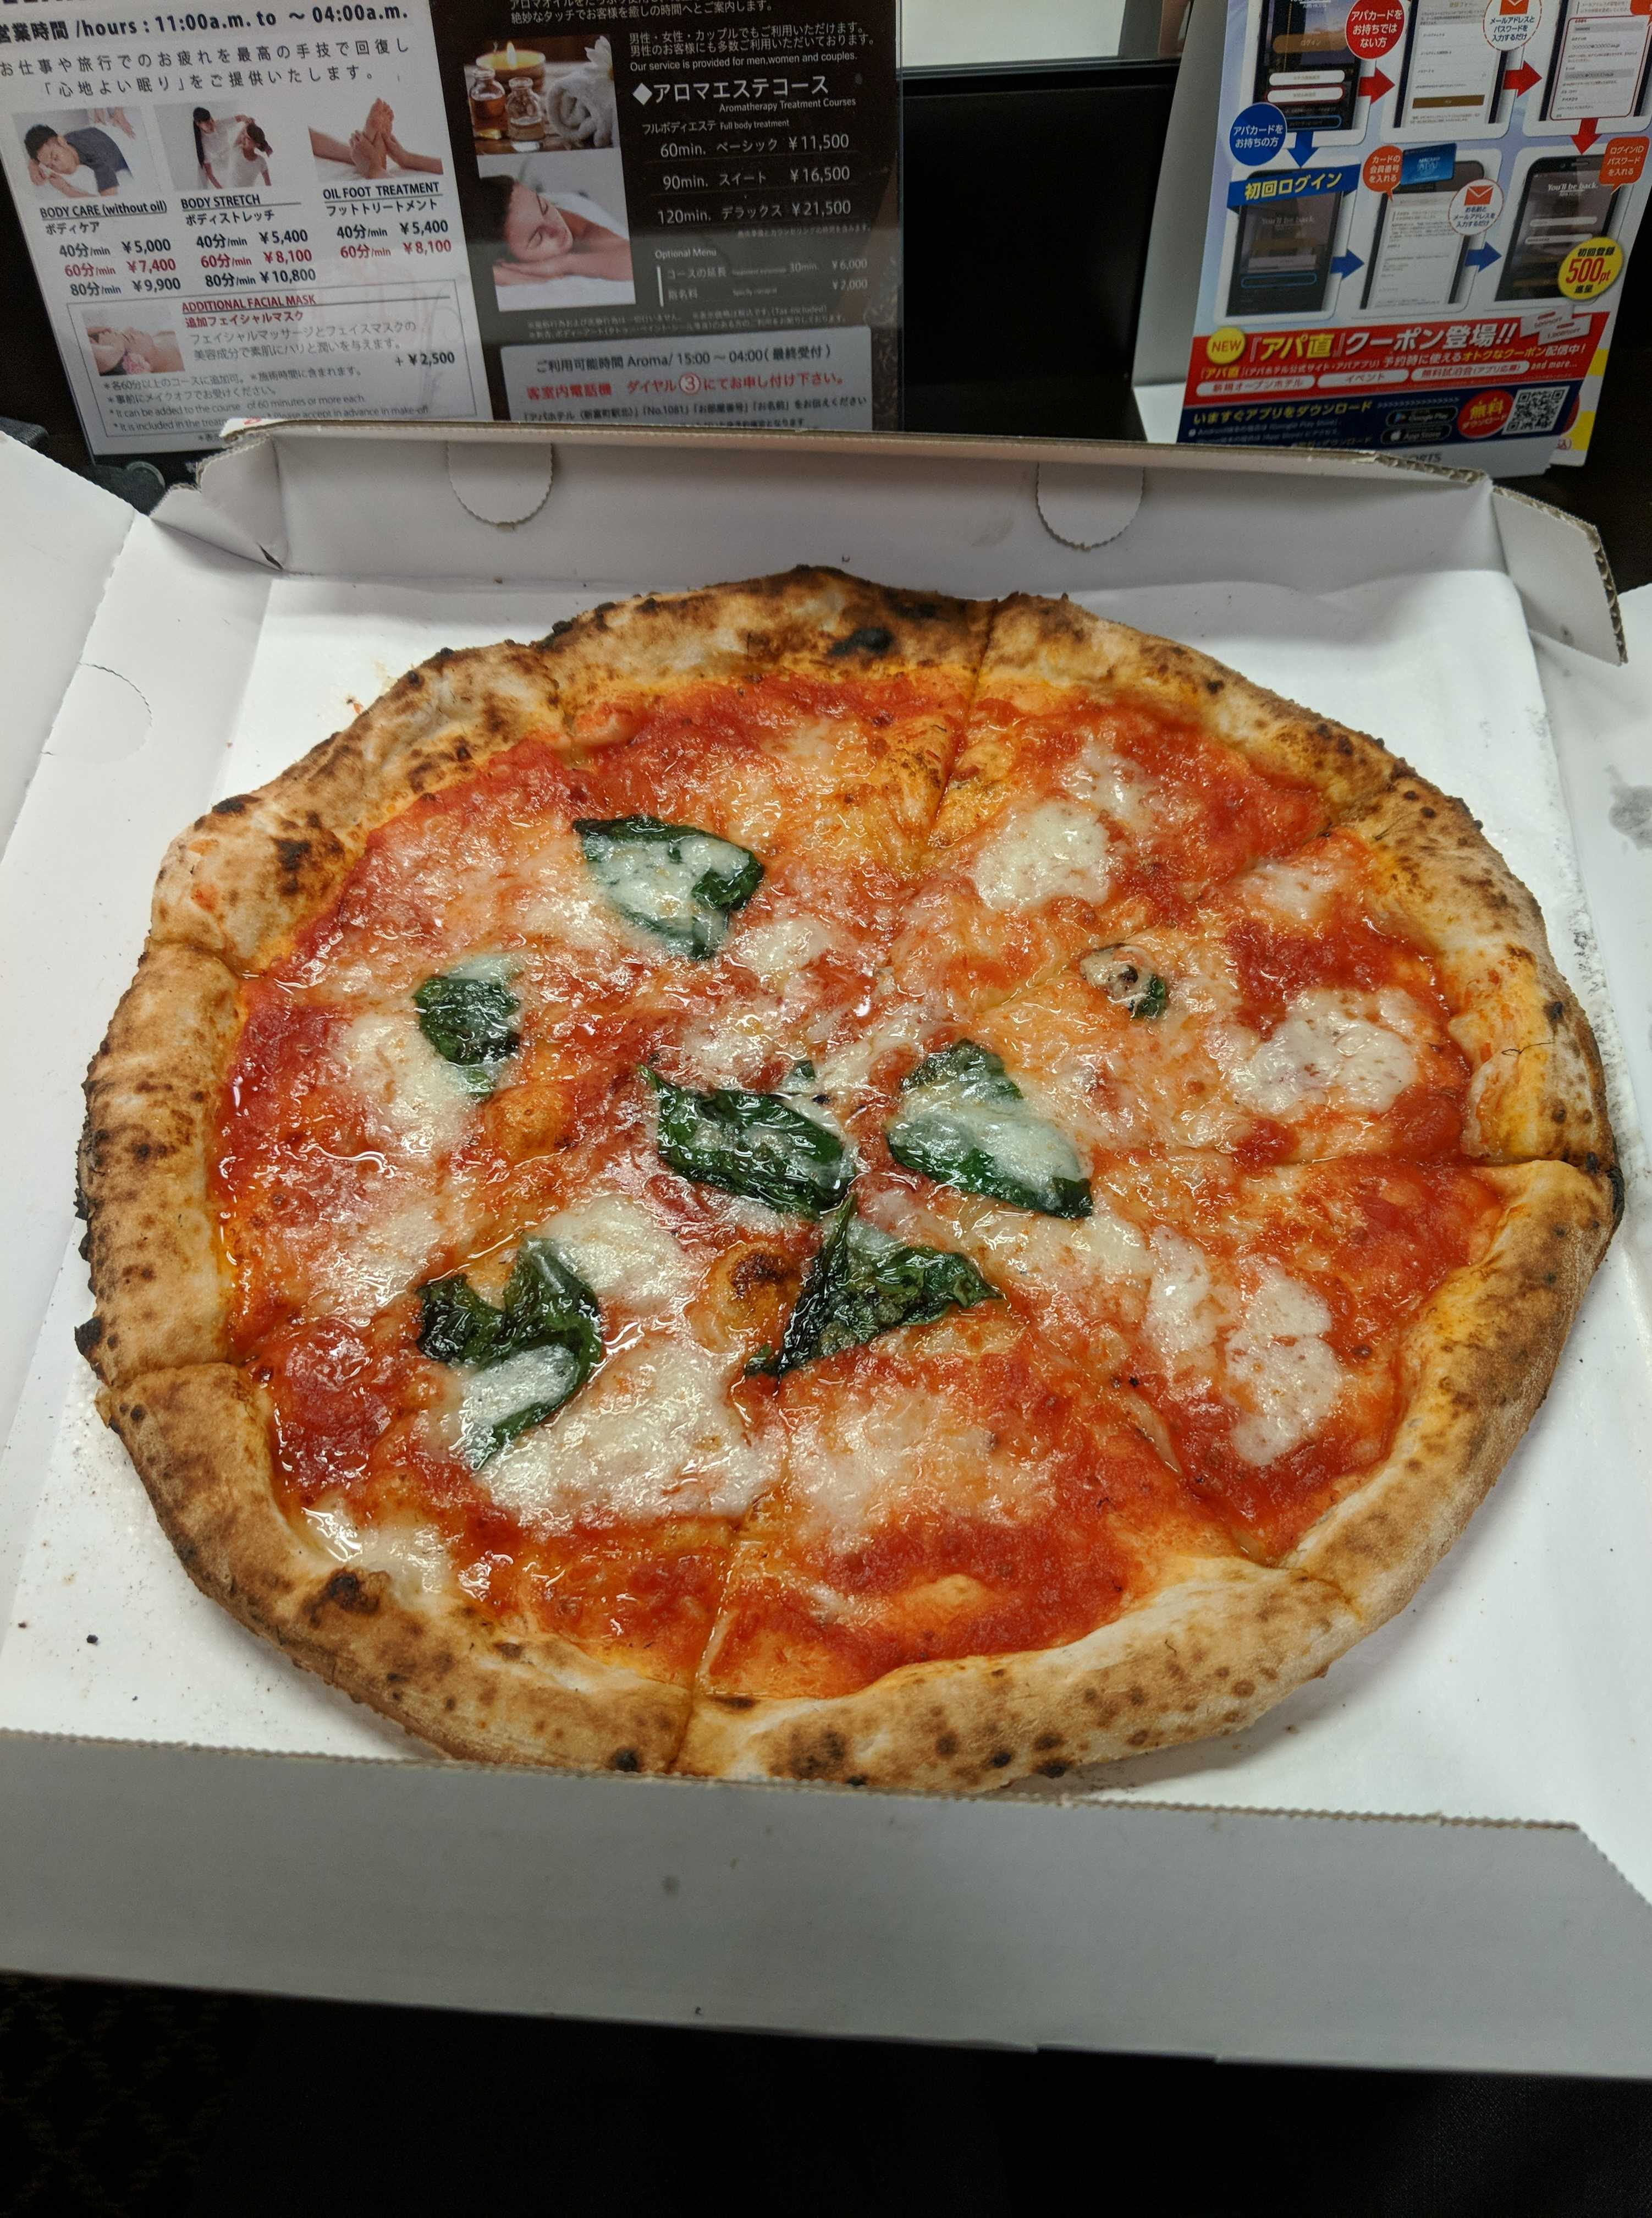 matt.brod1 on One Bite Pizza App